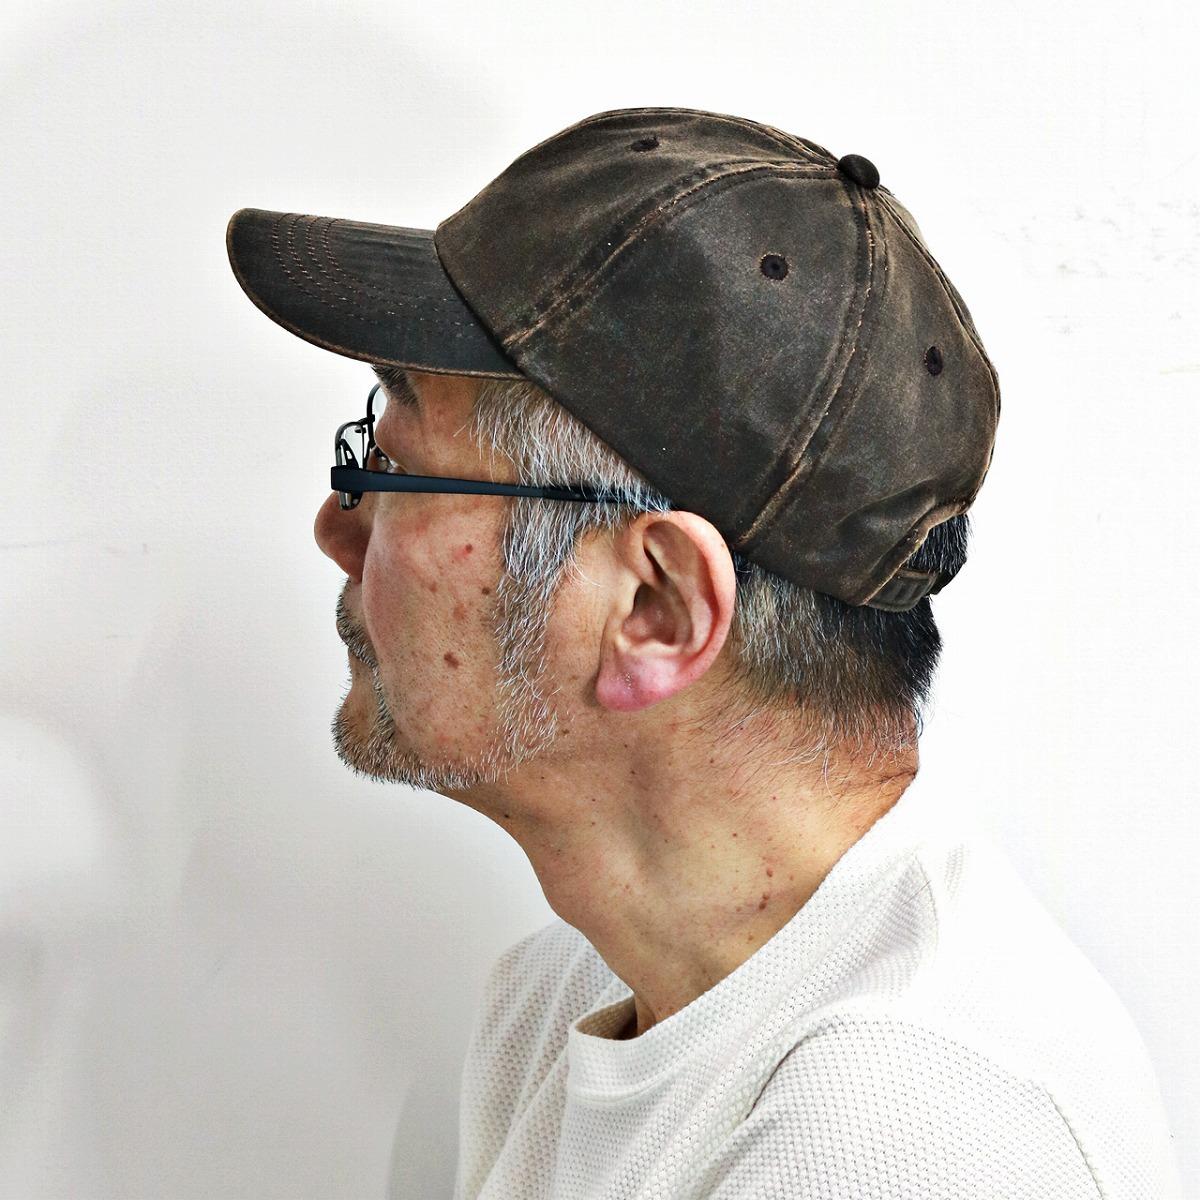 ... Dorfman Pacific vintage Cap mens fall winter Hat baseball caps men s  all season weathered cotton ... 3ca7cc903d2f